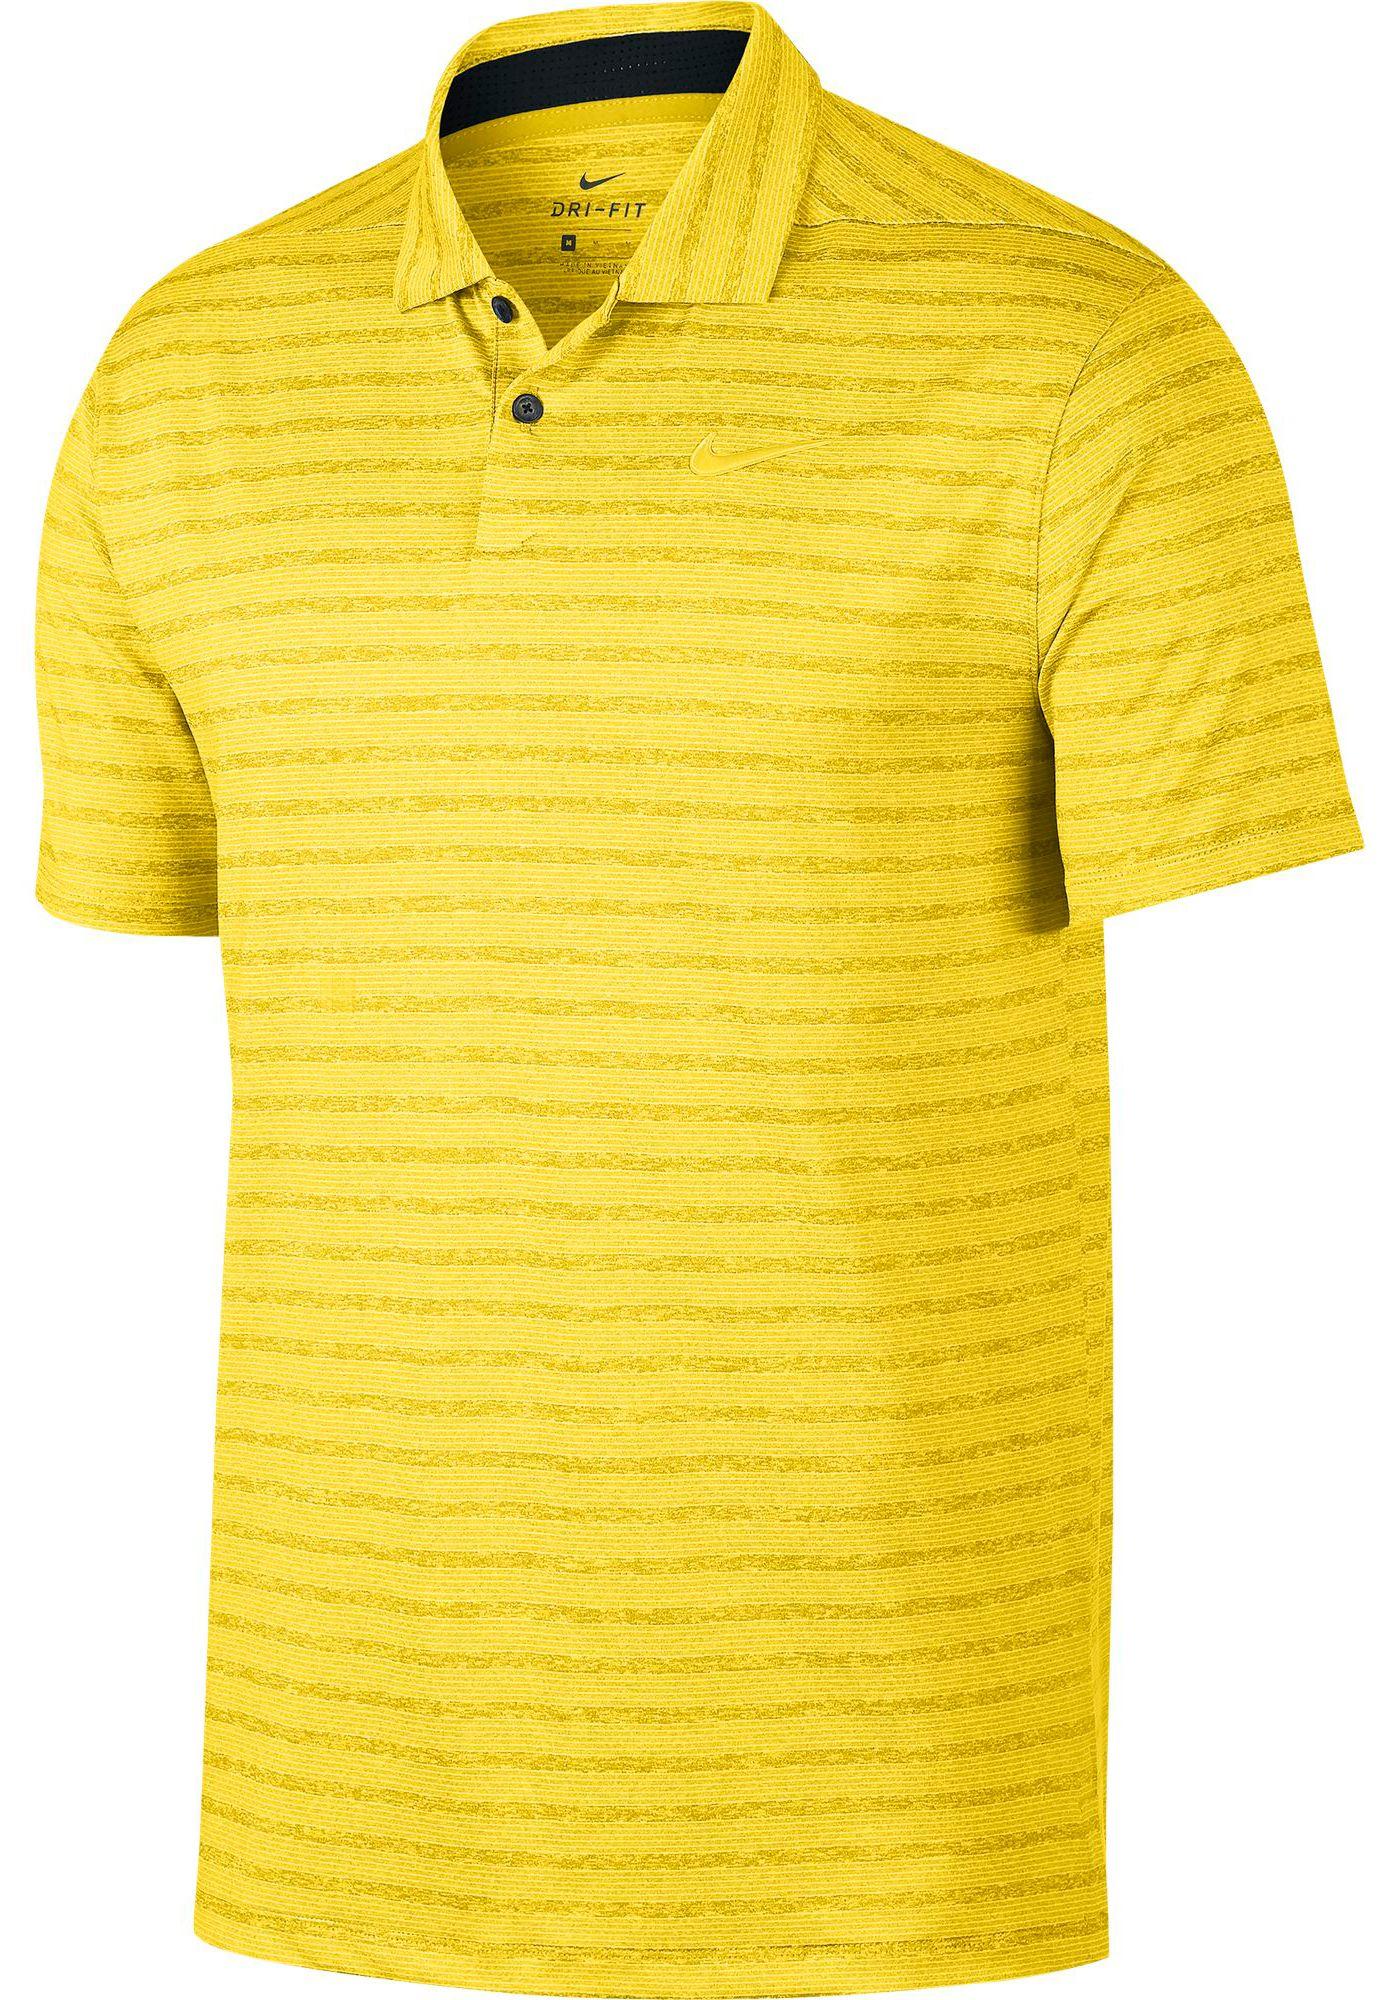 Nike Men's Vapor Stripe Golf Polo